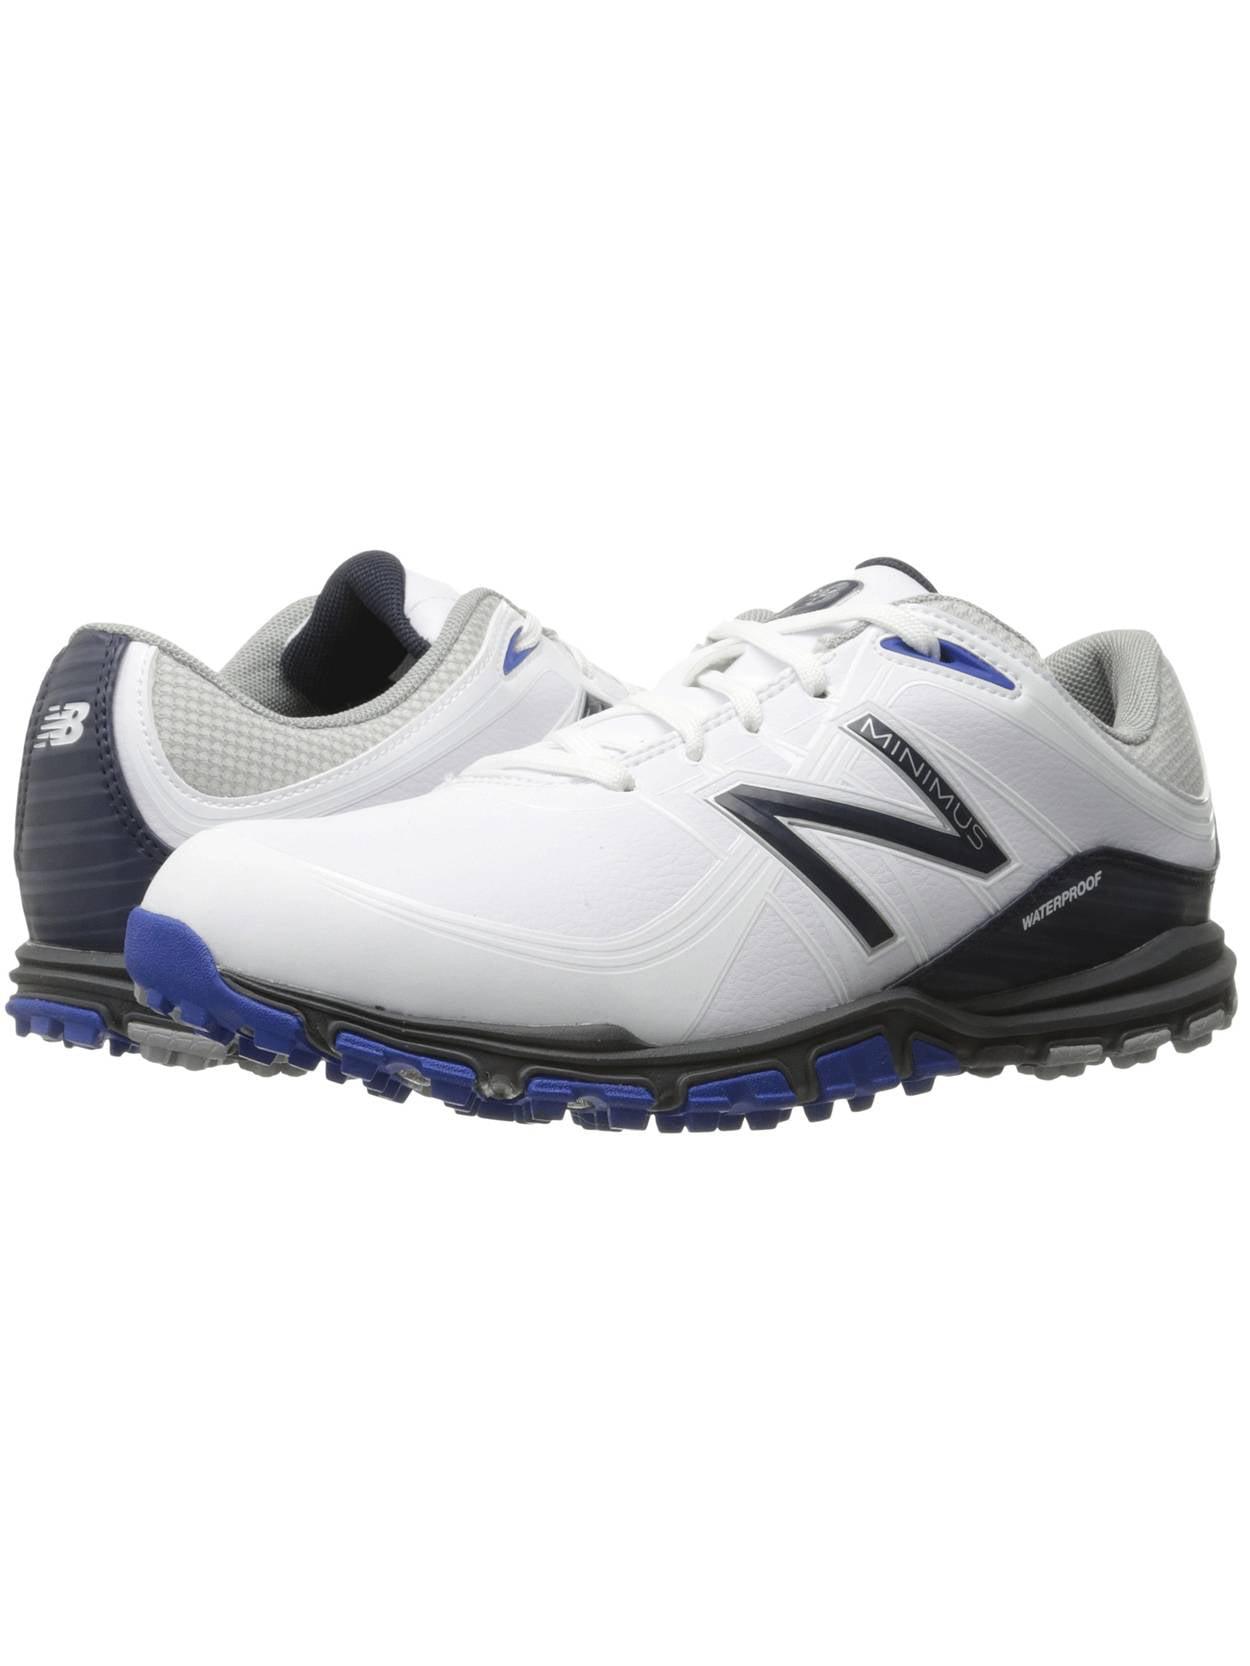 New Balance NBG1005 Men's Minimus Spikeless Golf Shoe, Brand New - by New Balance